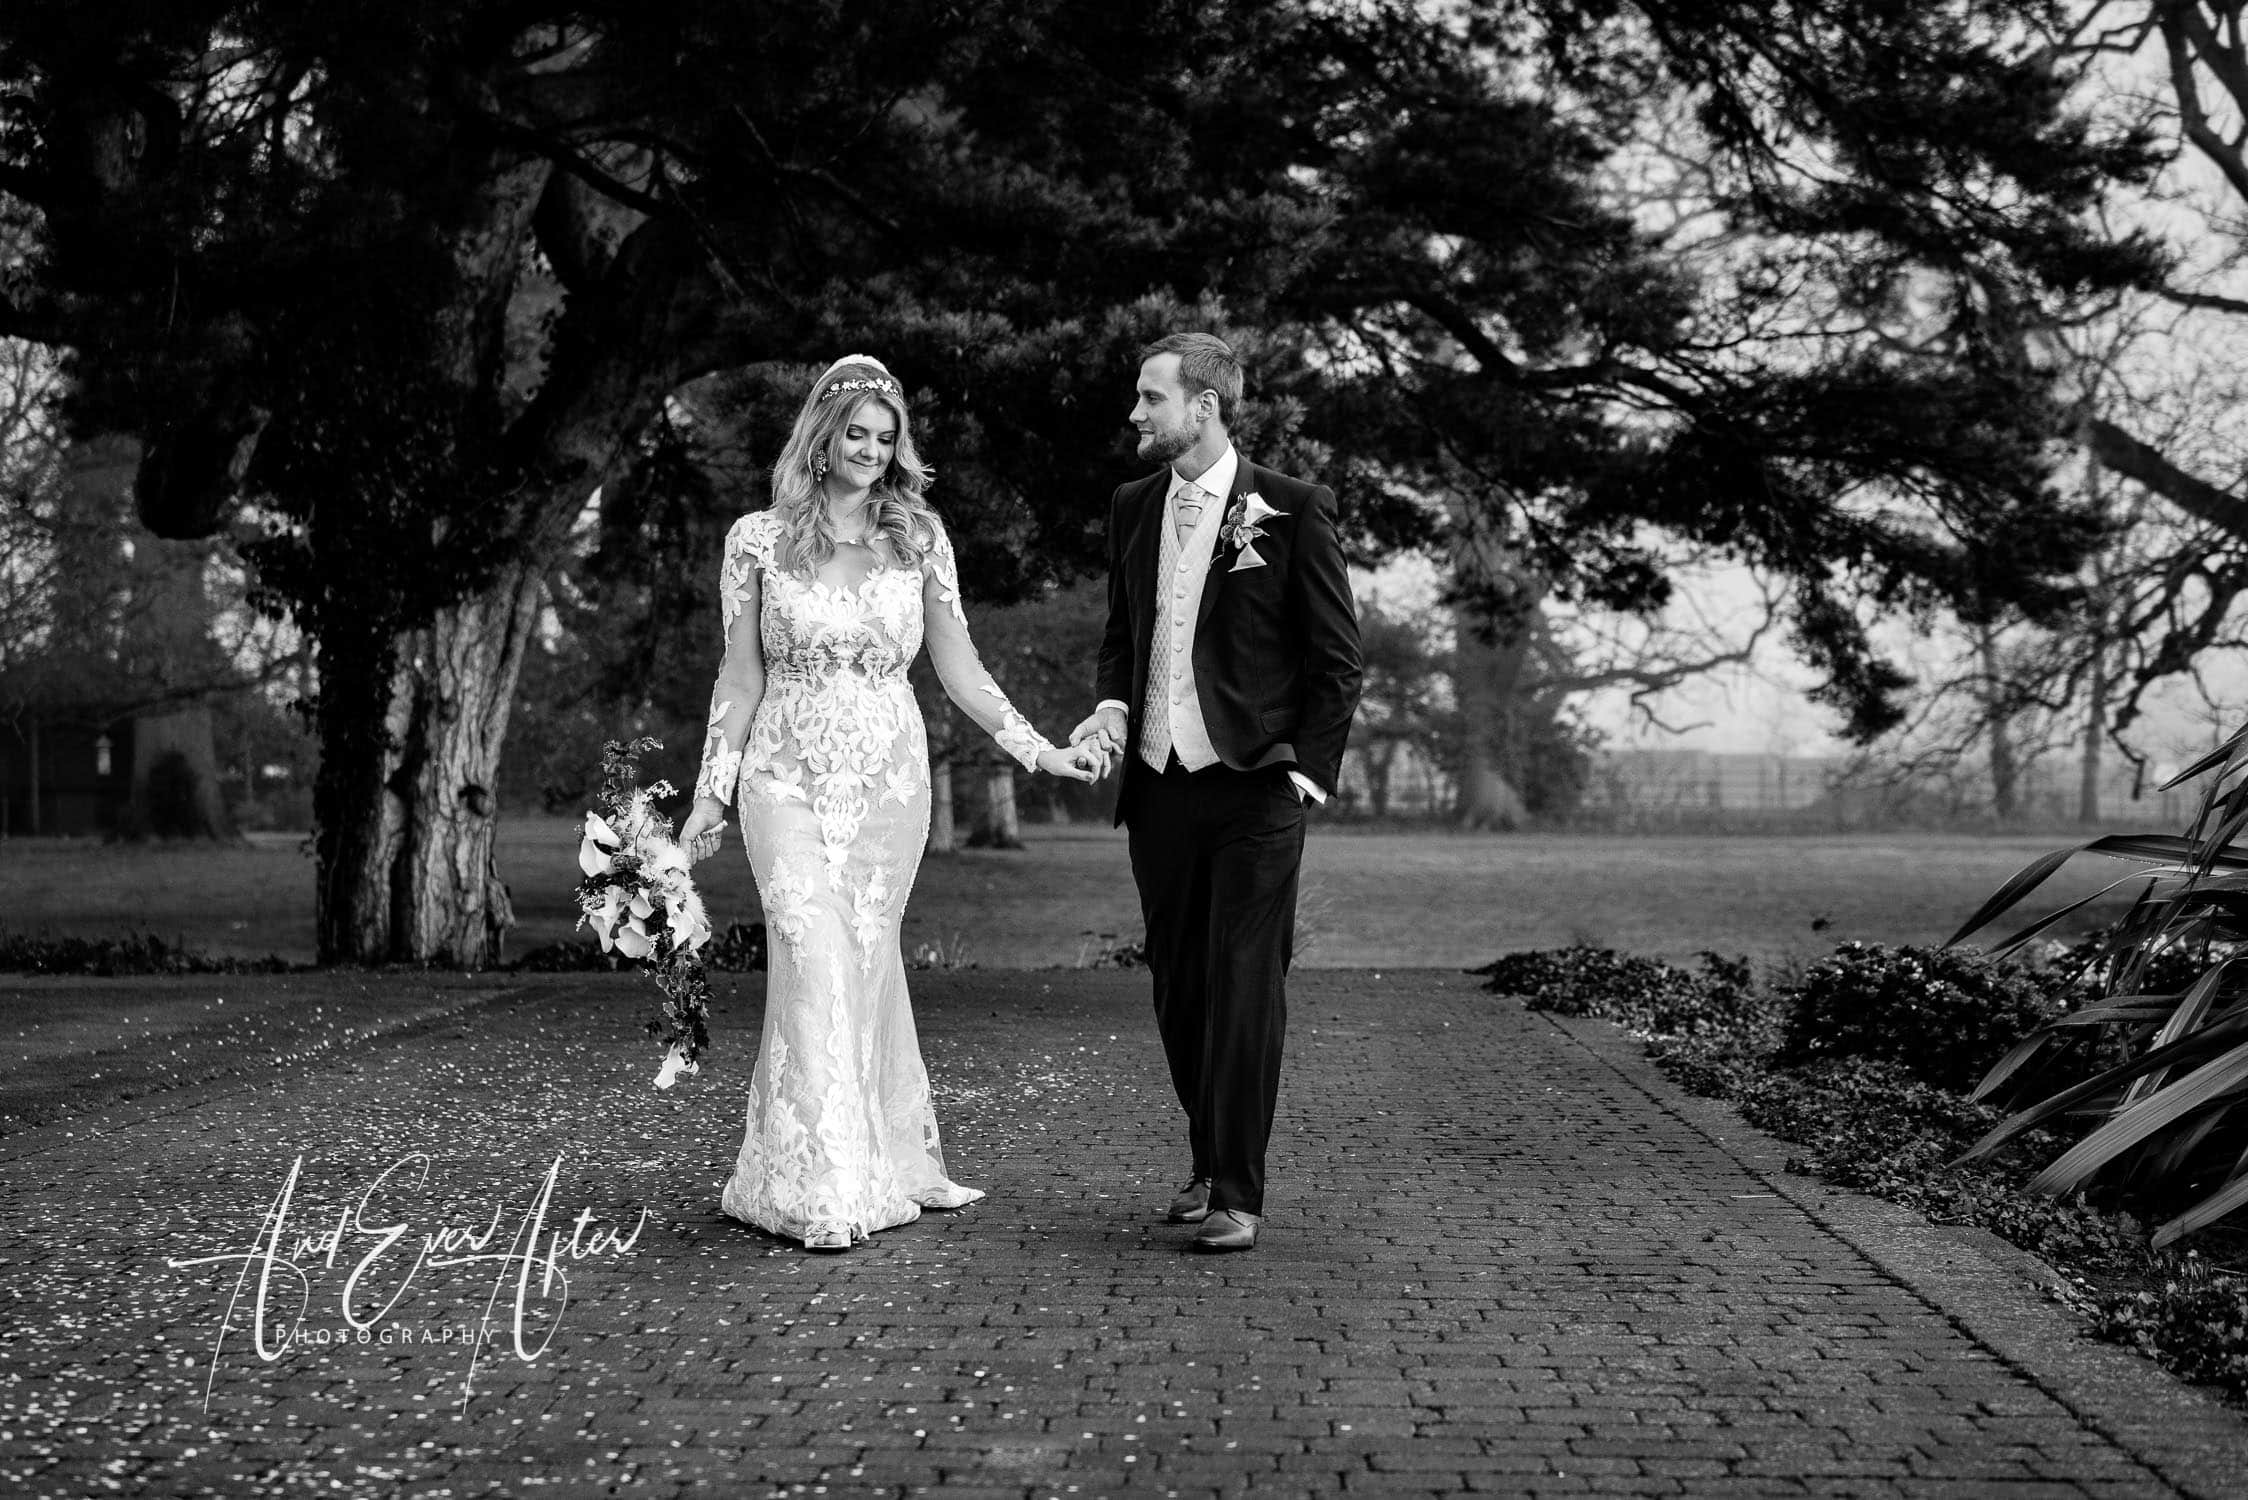 rockliffe hall wedding, county durham wedding photographer, bride and groom walking in the grounds of Rockliffe Hall, wedding day